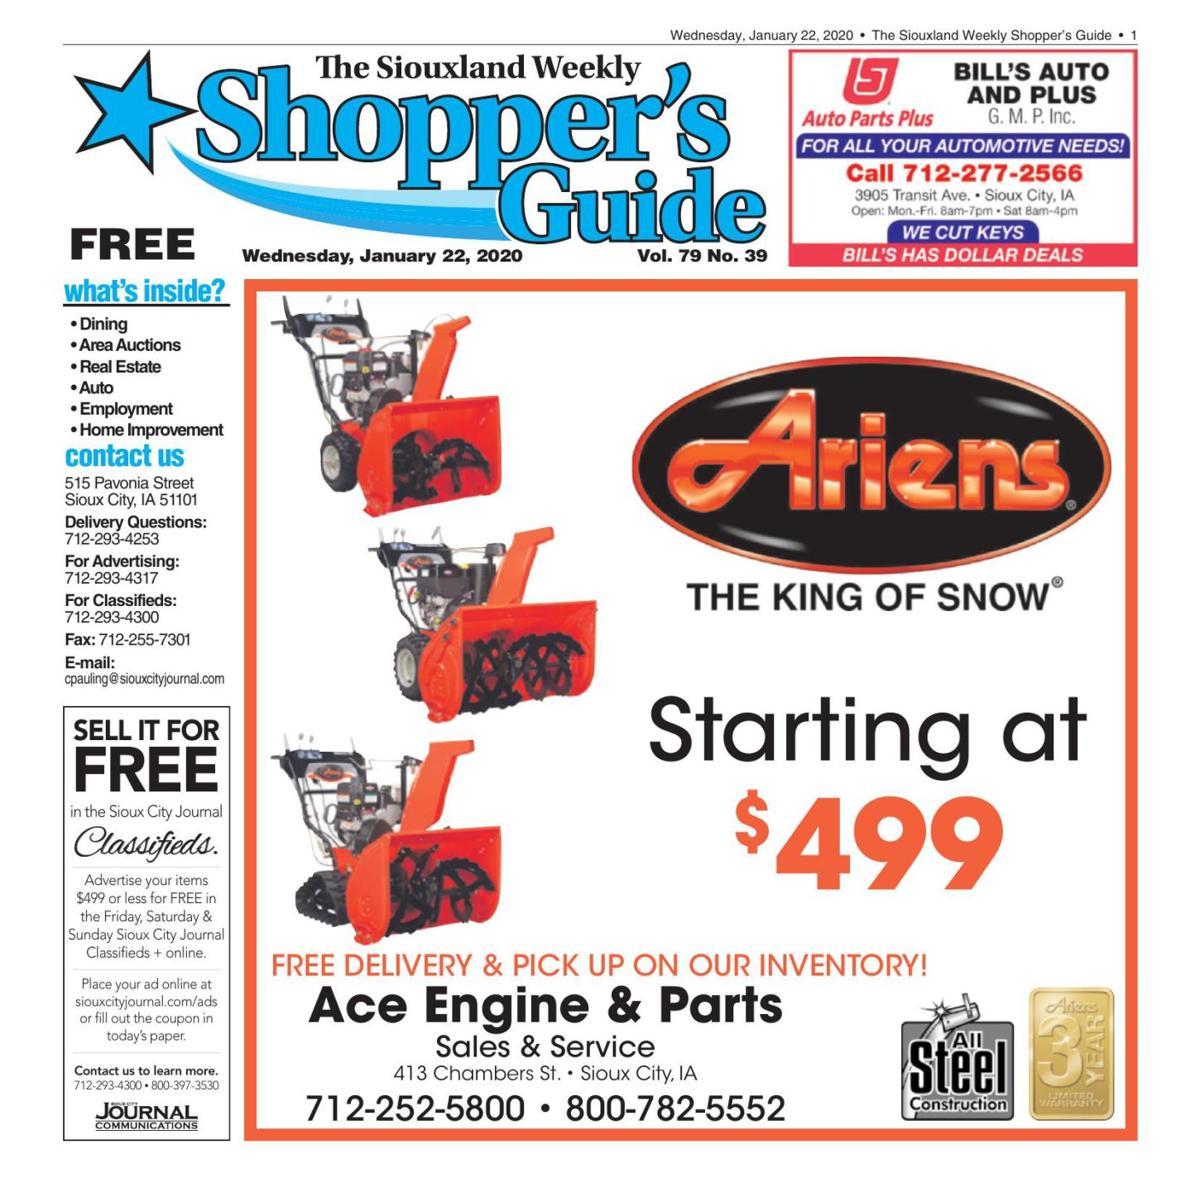 Shopper's Guide - January 22, 2020